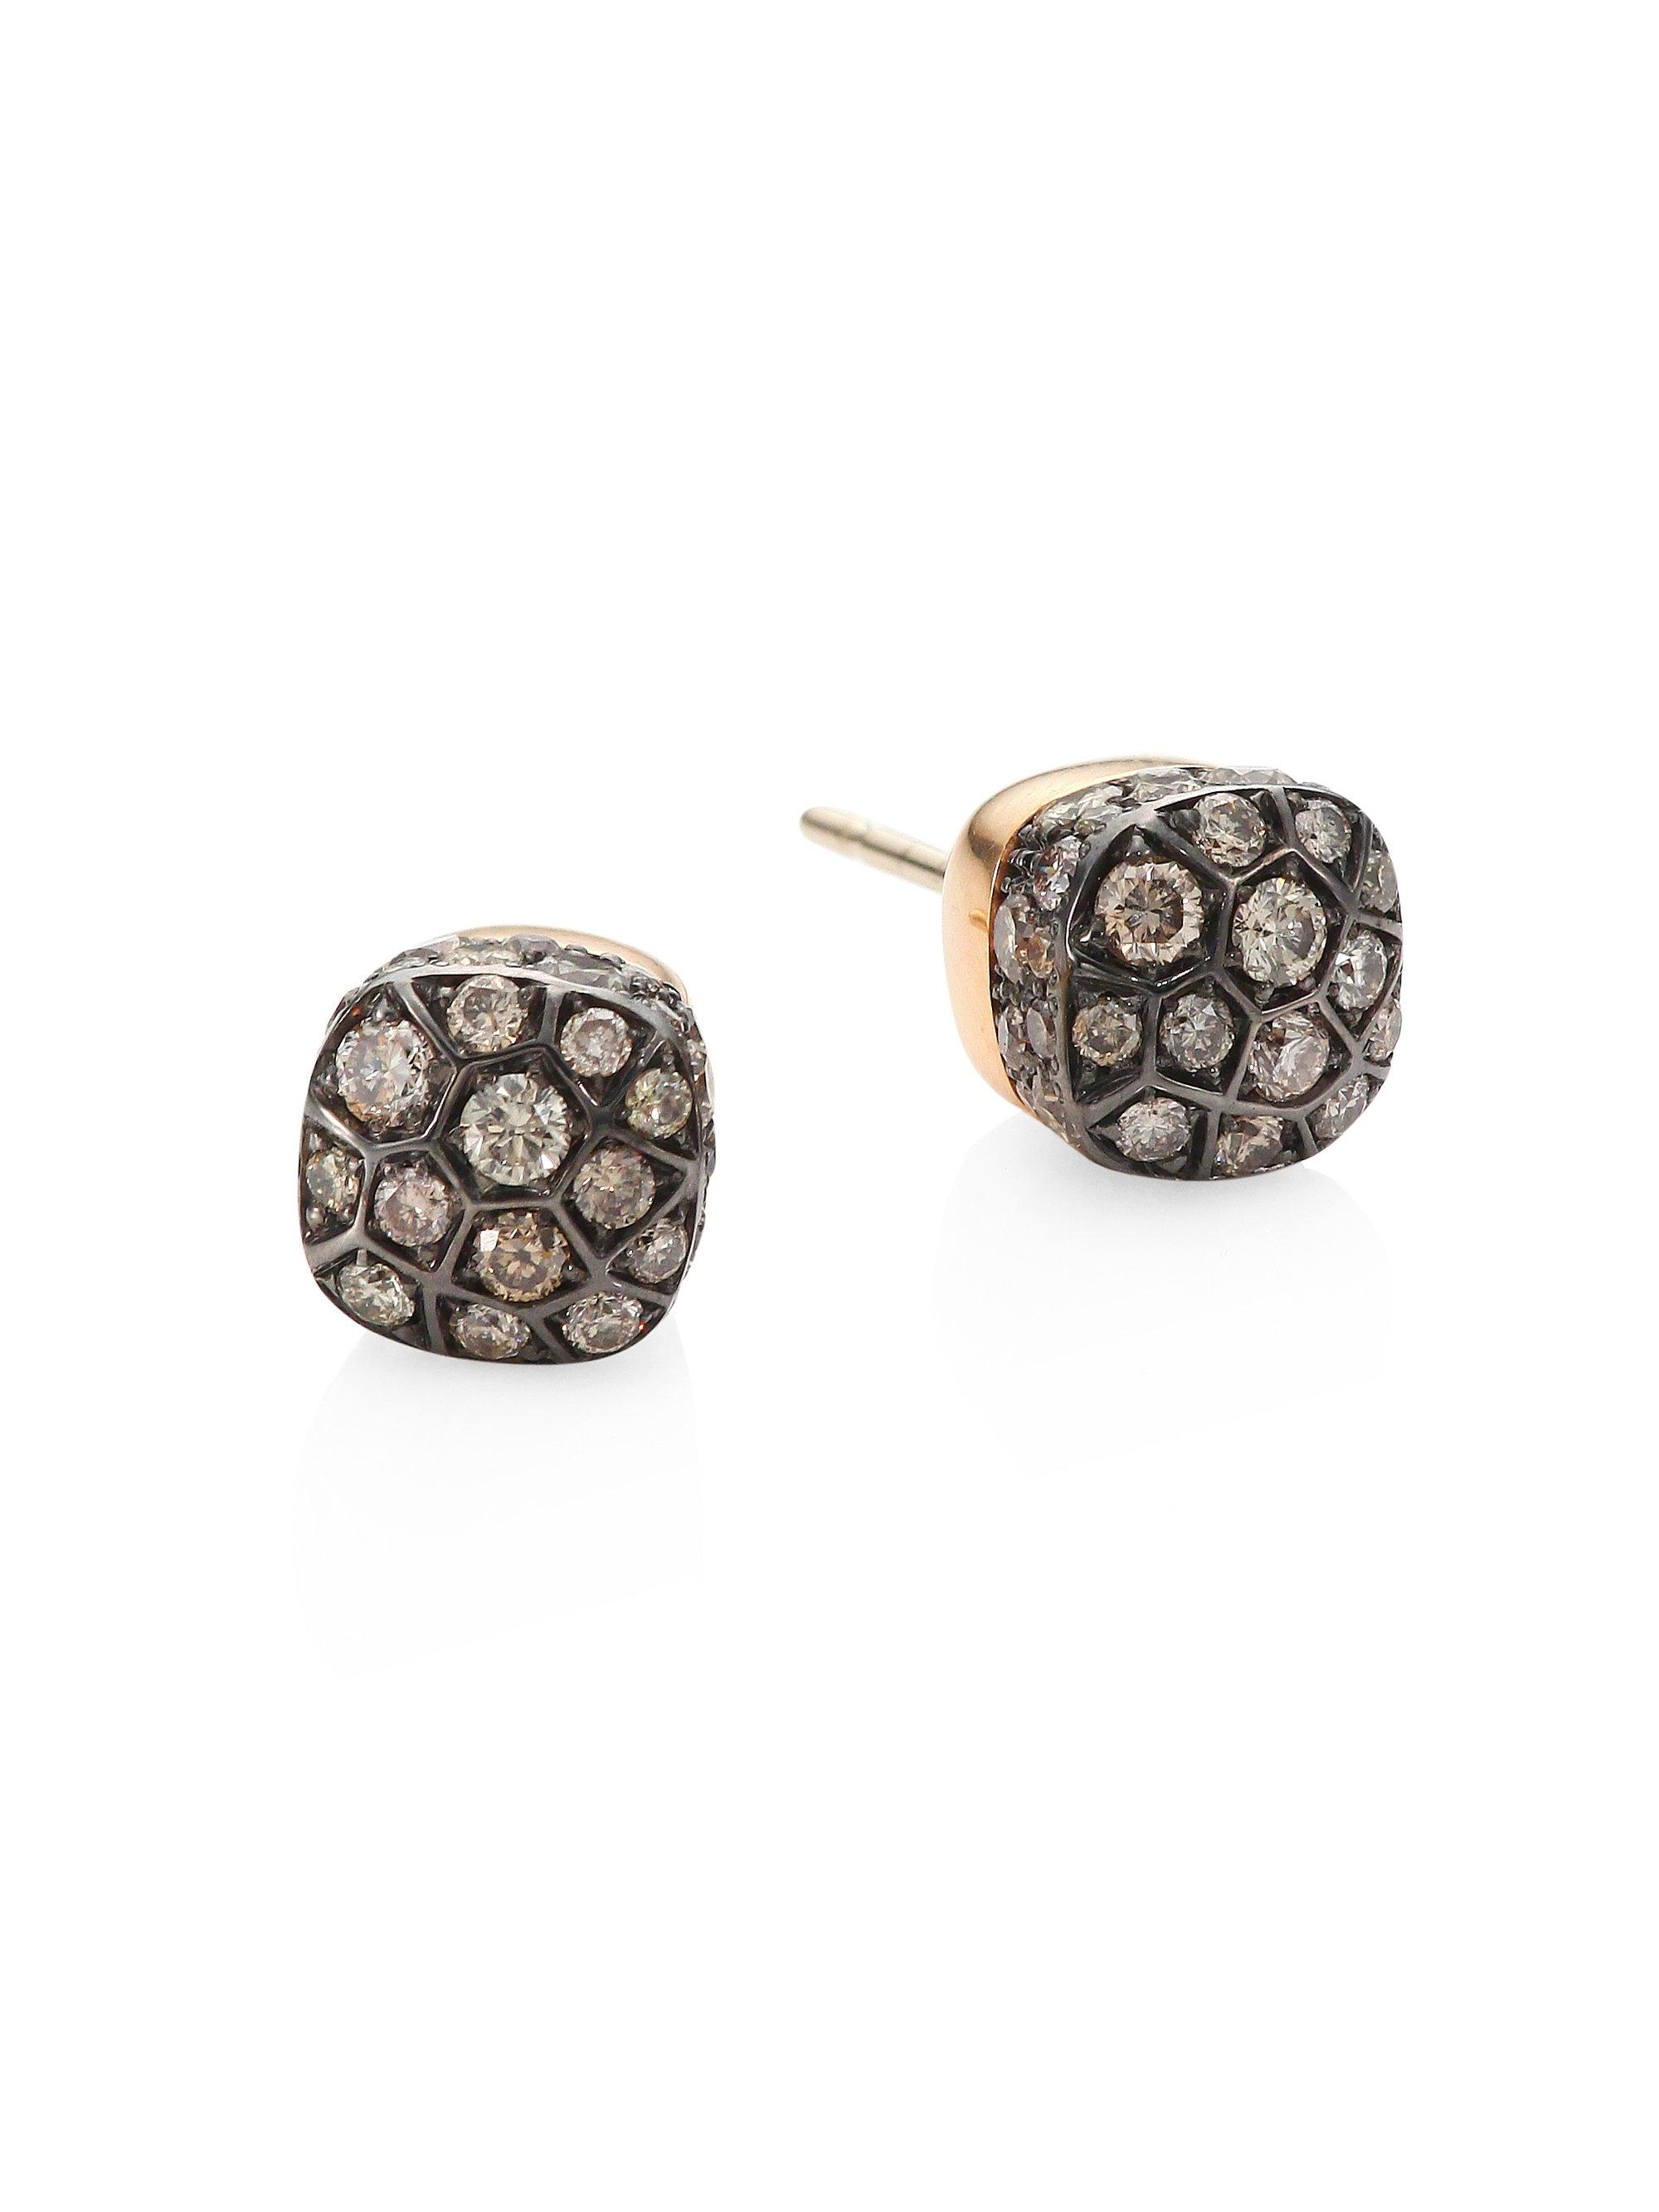 POMELLATO Nudo 18K White & Rose Gold and Diamond Earrings c302OFSx